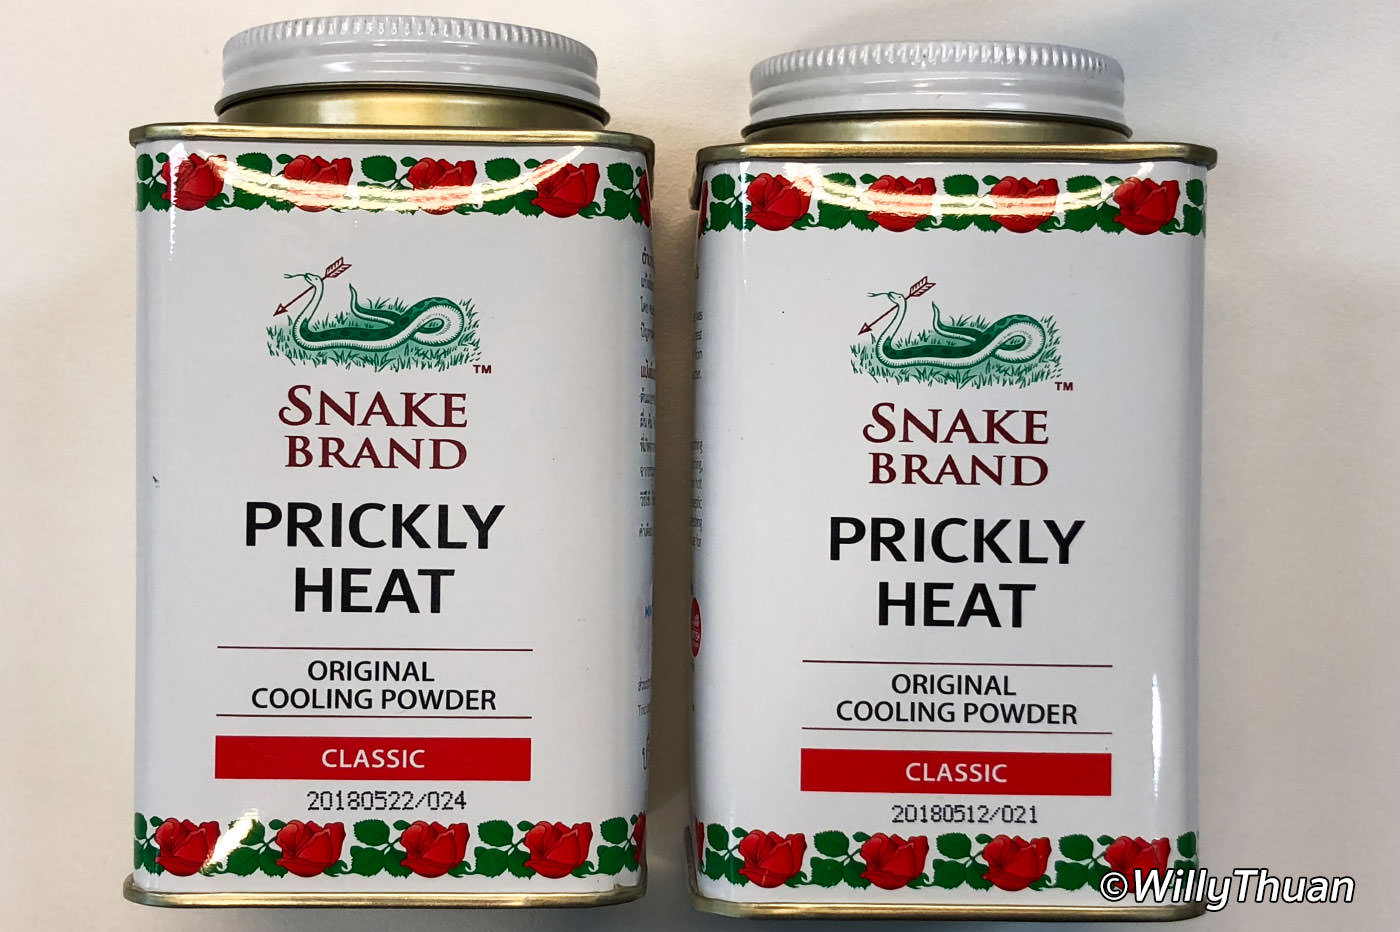 Prickly Heat Snake Brand